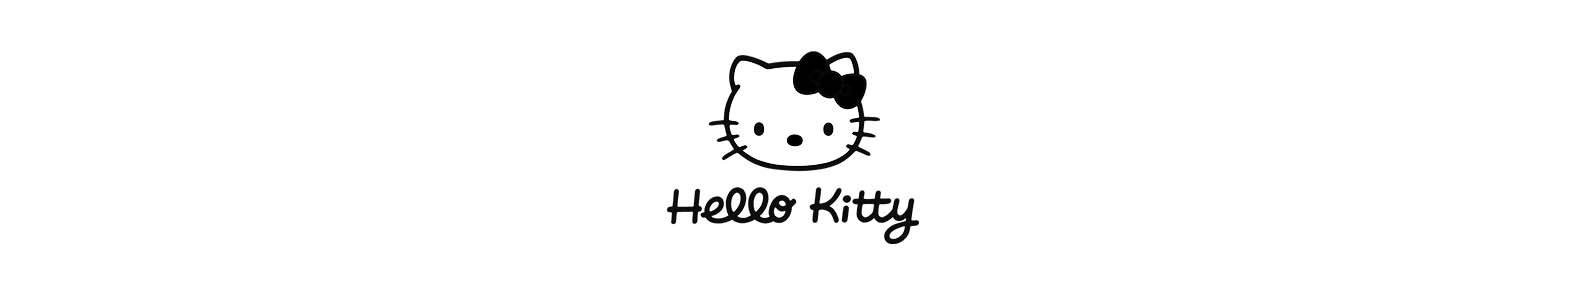 Hello Kitty brand header image